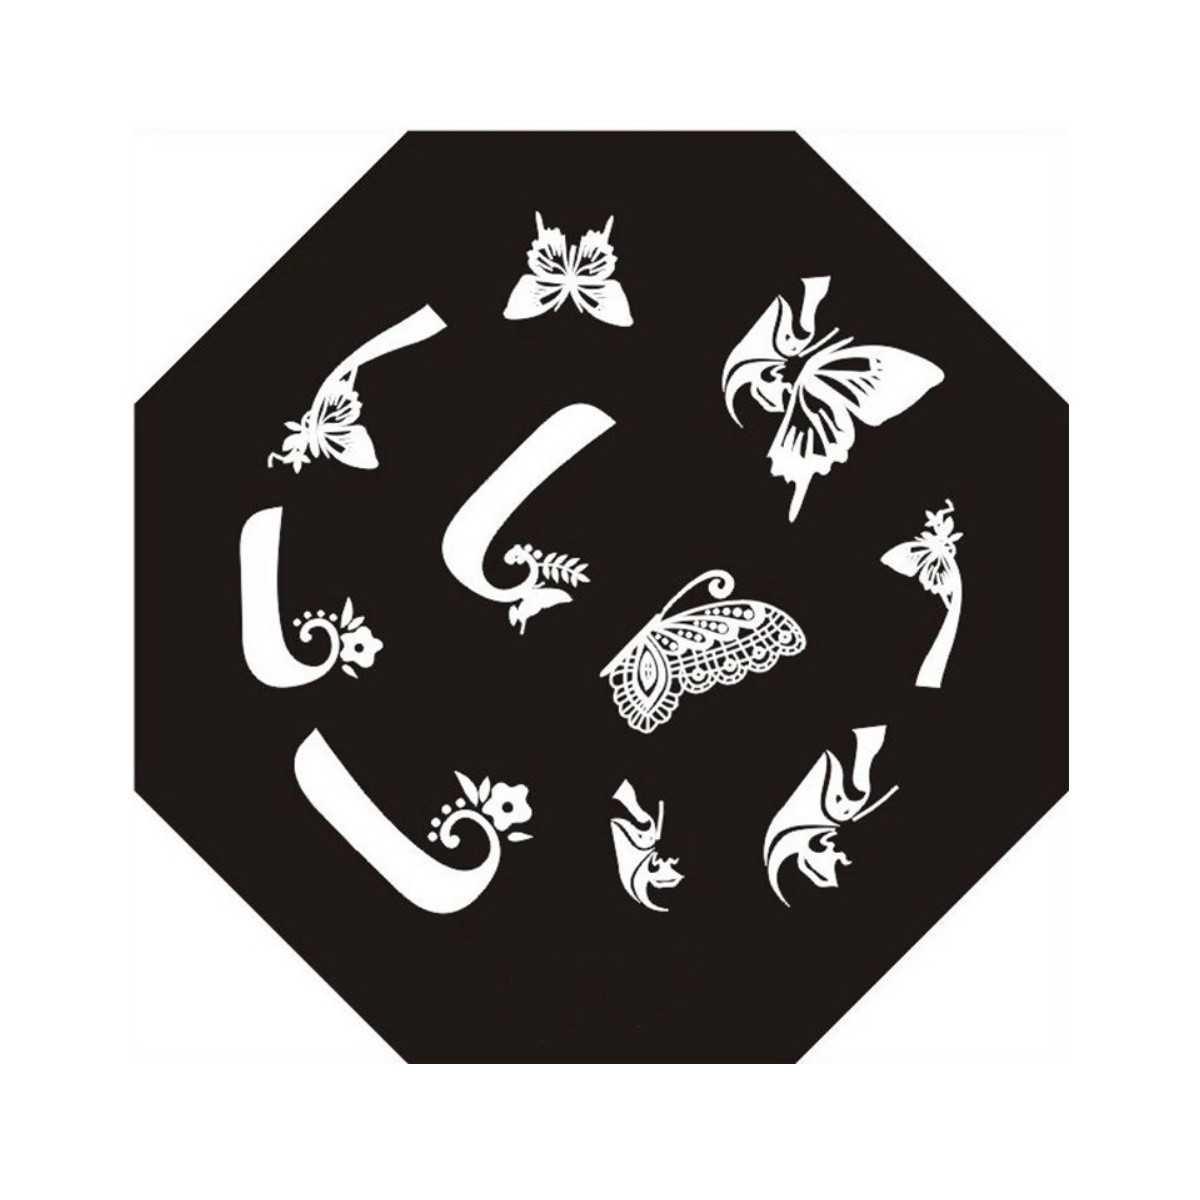 https://www.kit-manucure.com/2170-thickbox_default/plaque-de-stamping-papillon-motifs-assortis.jpg